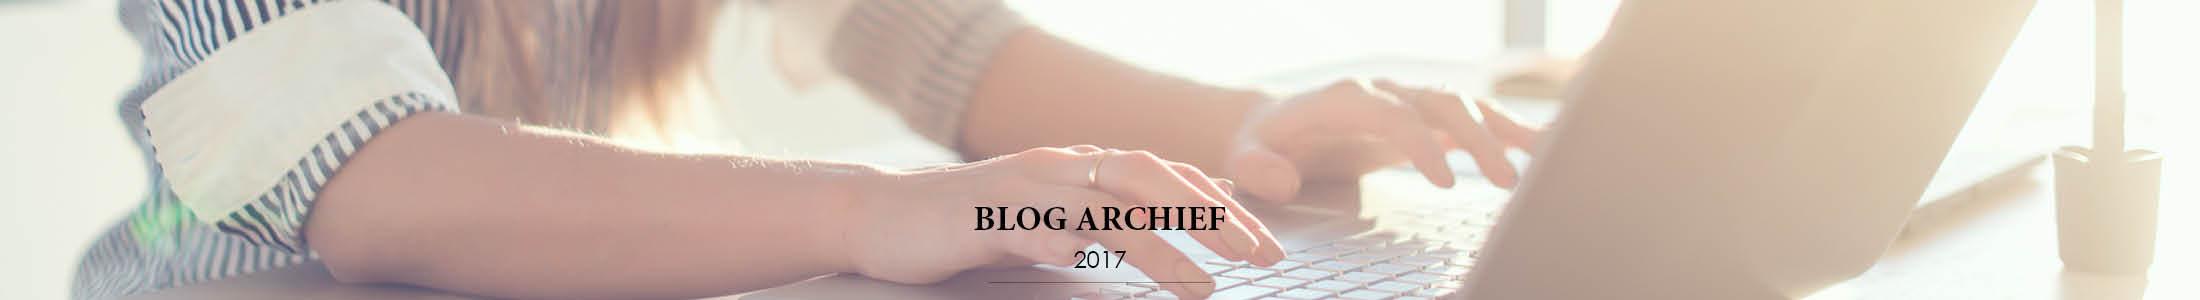 Blog Archief 2017